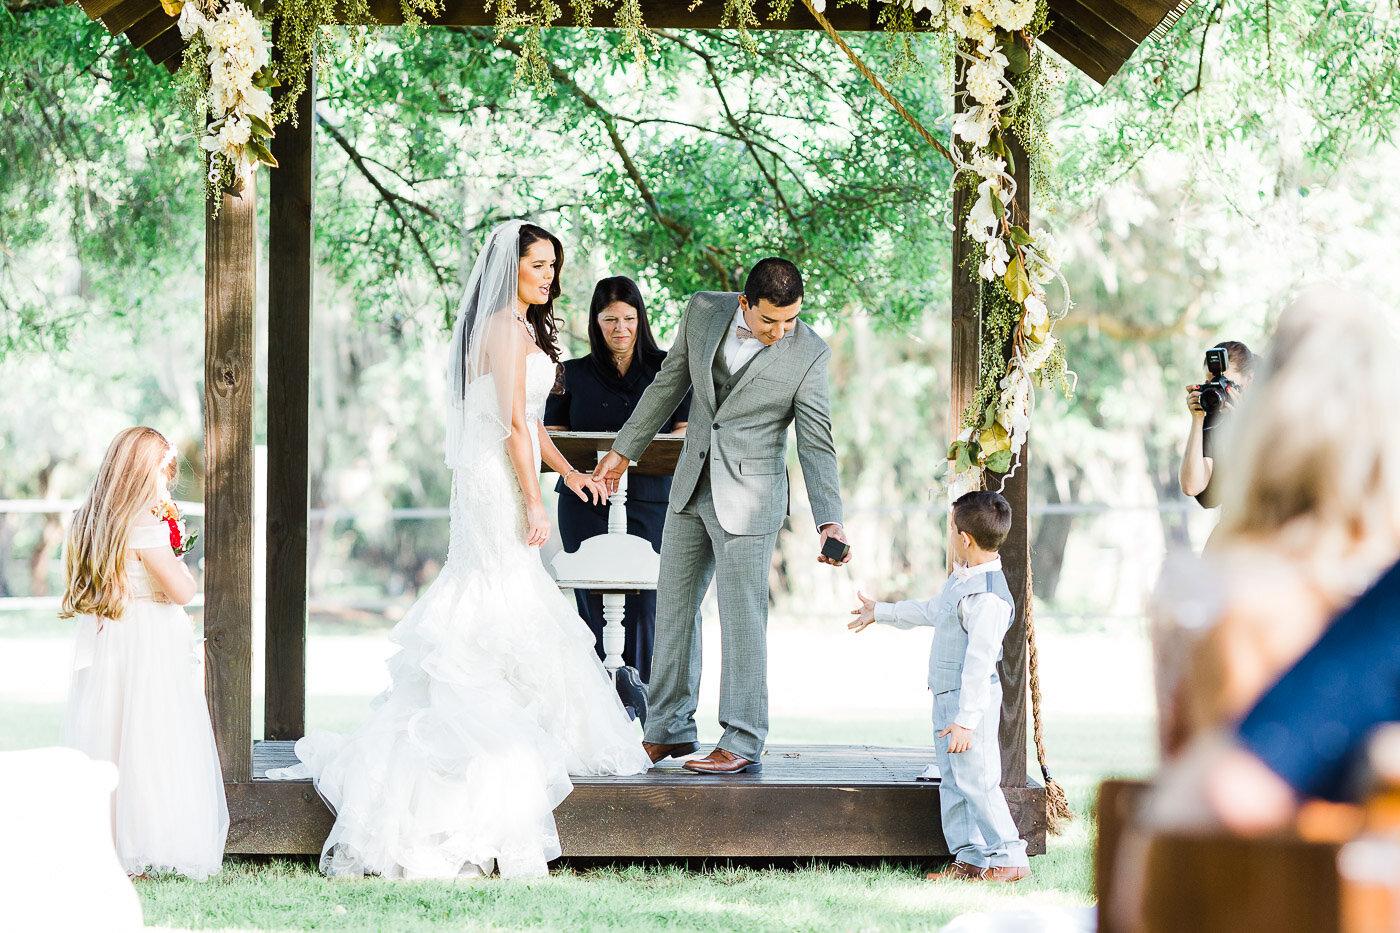 Lakeland-barn-wedding-at-white-horse-ranch-44.jpg